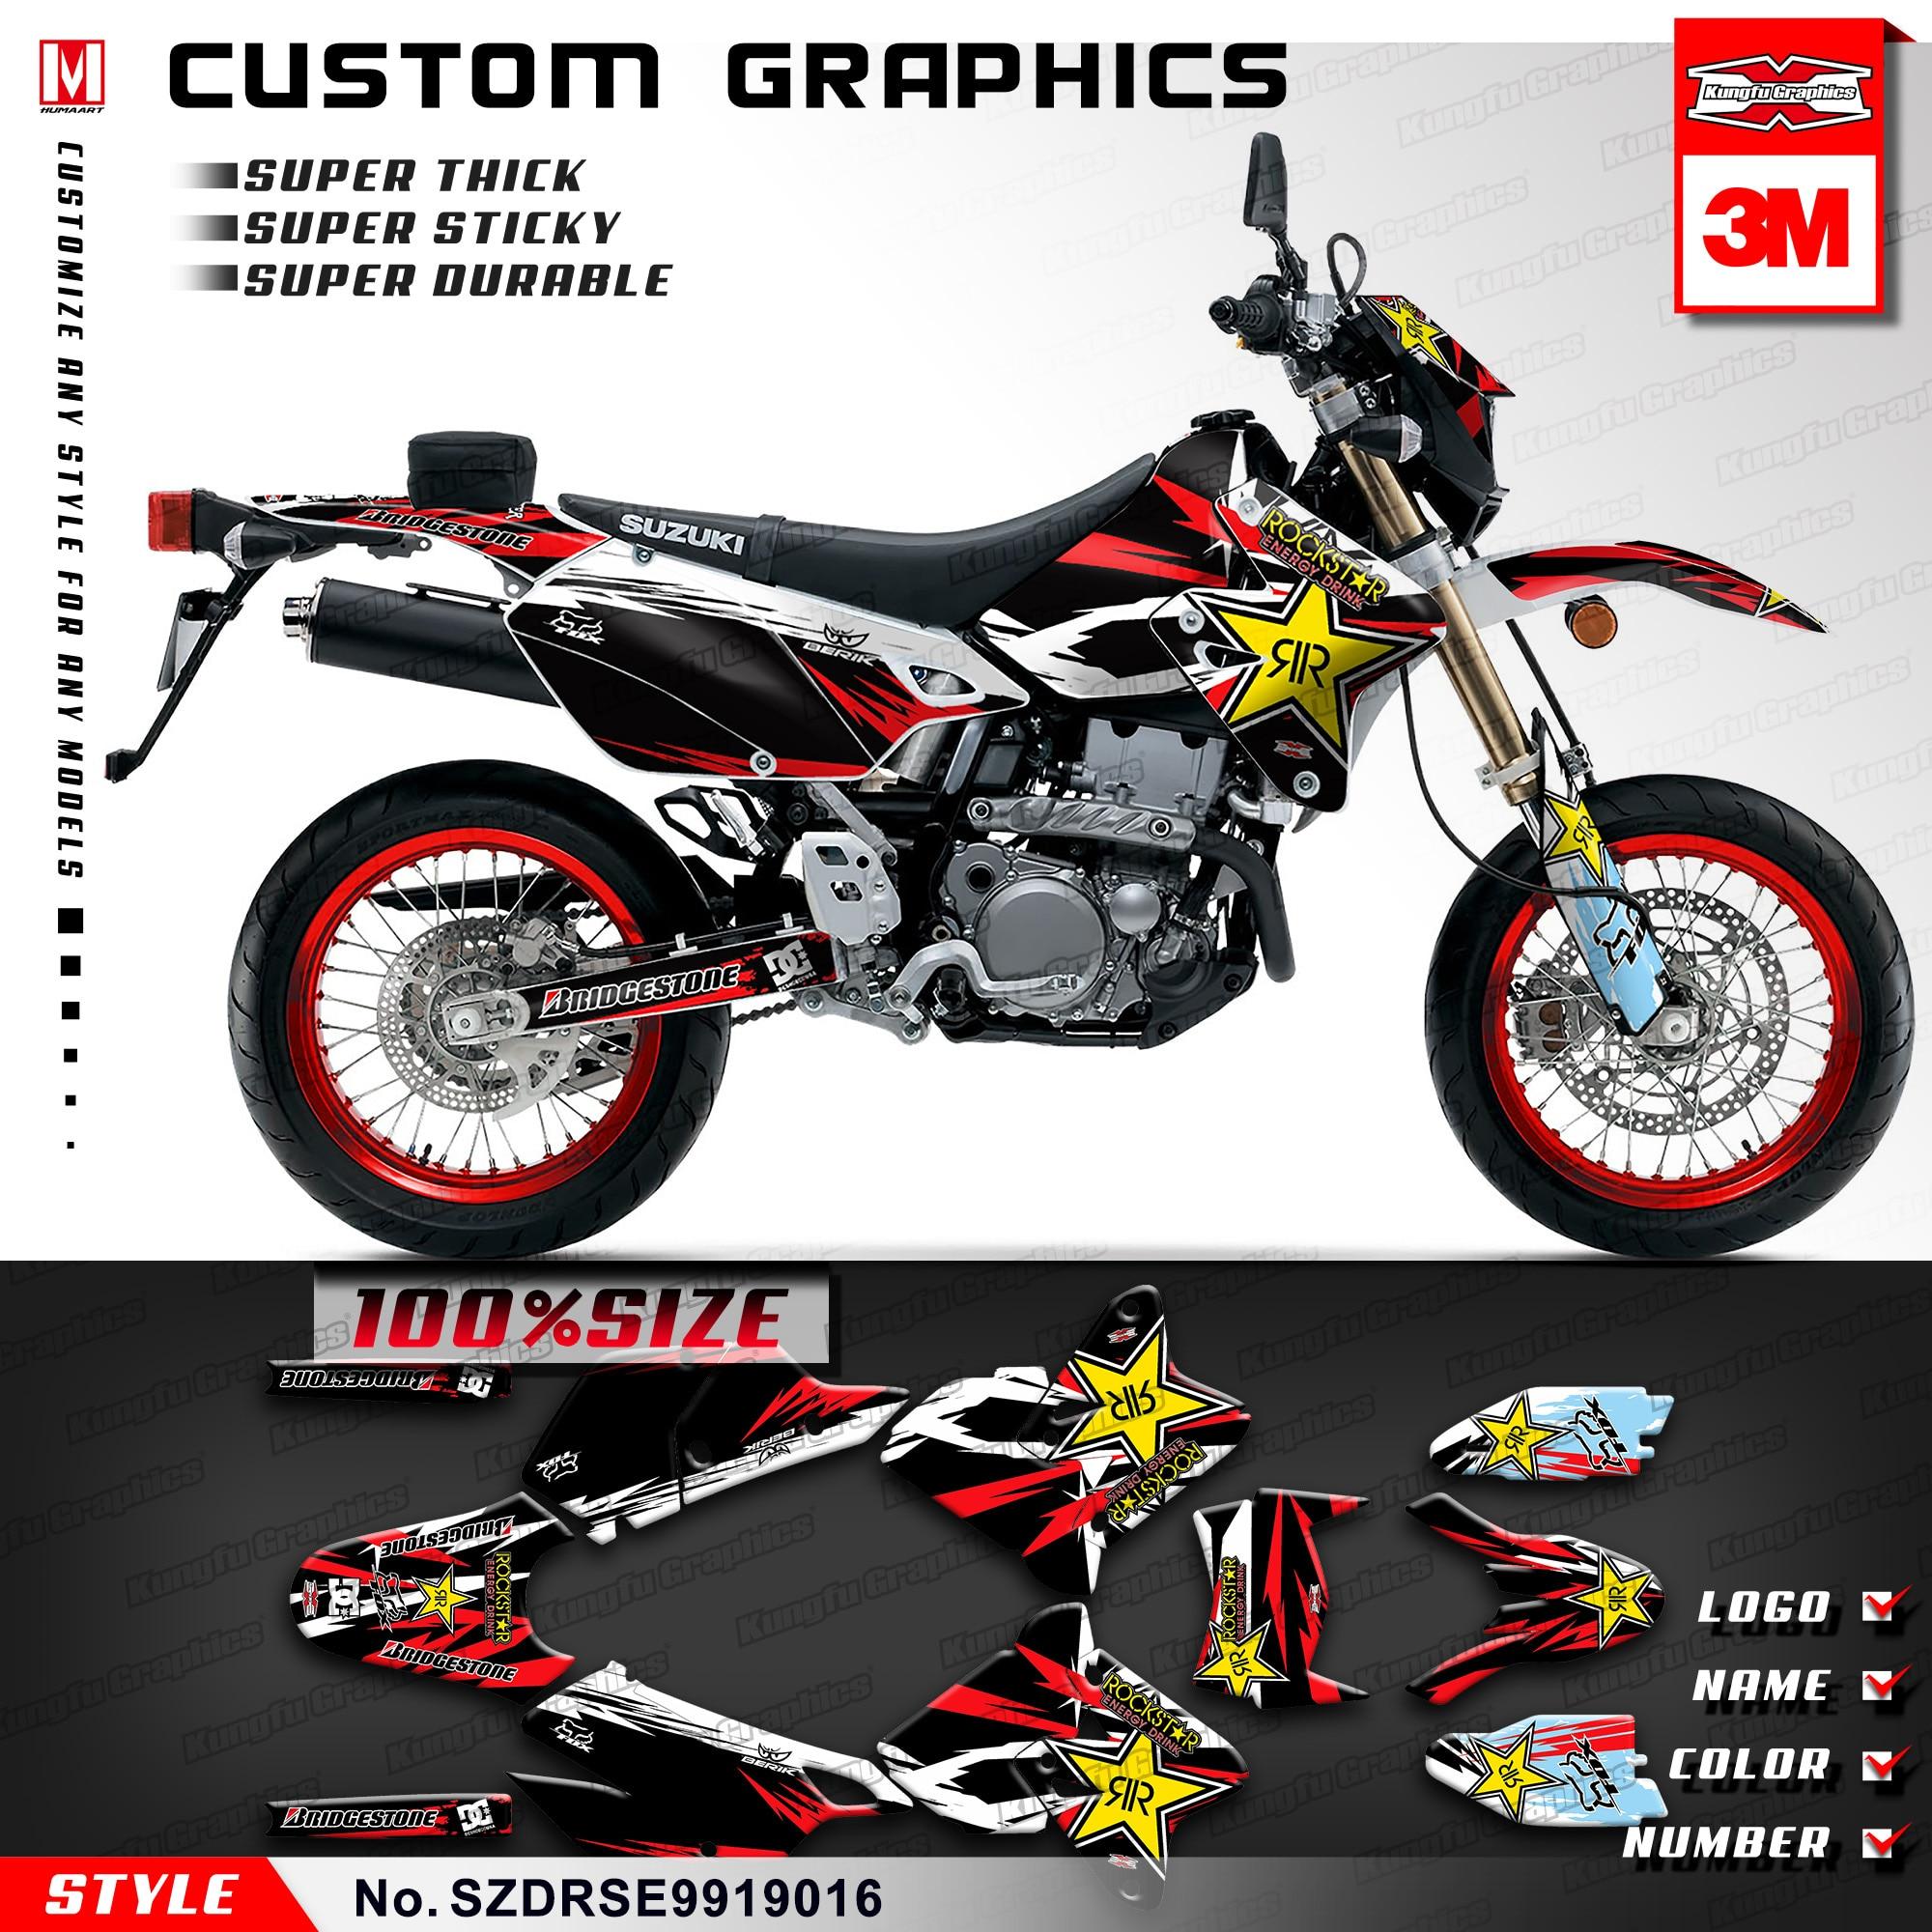 kungfu graphics mx racing decals kit custom stickers for suzuki drz 400 sm  supermoto drz400e 1999